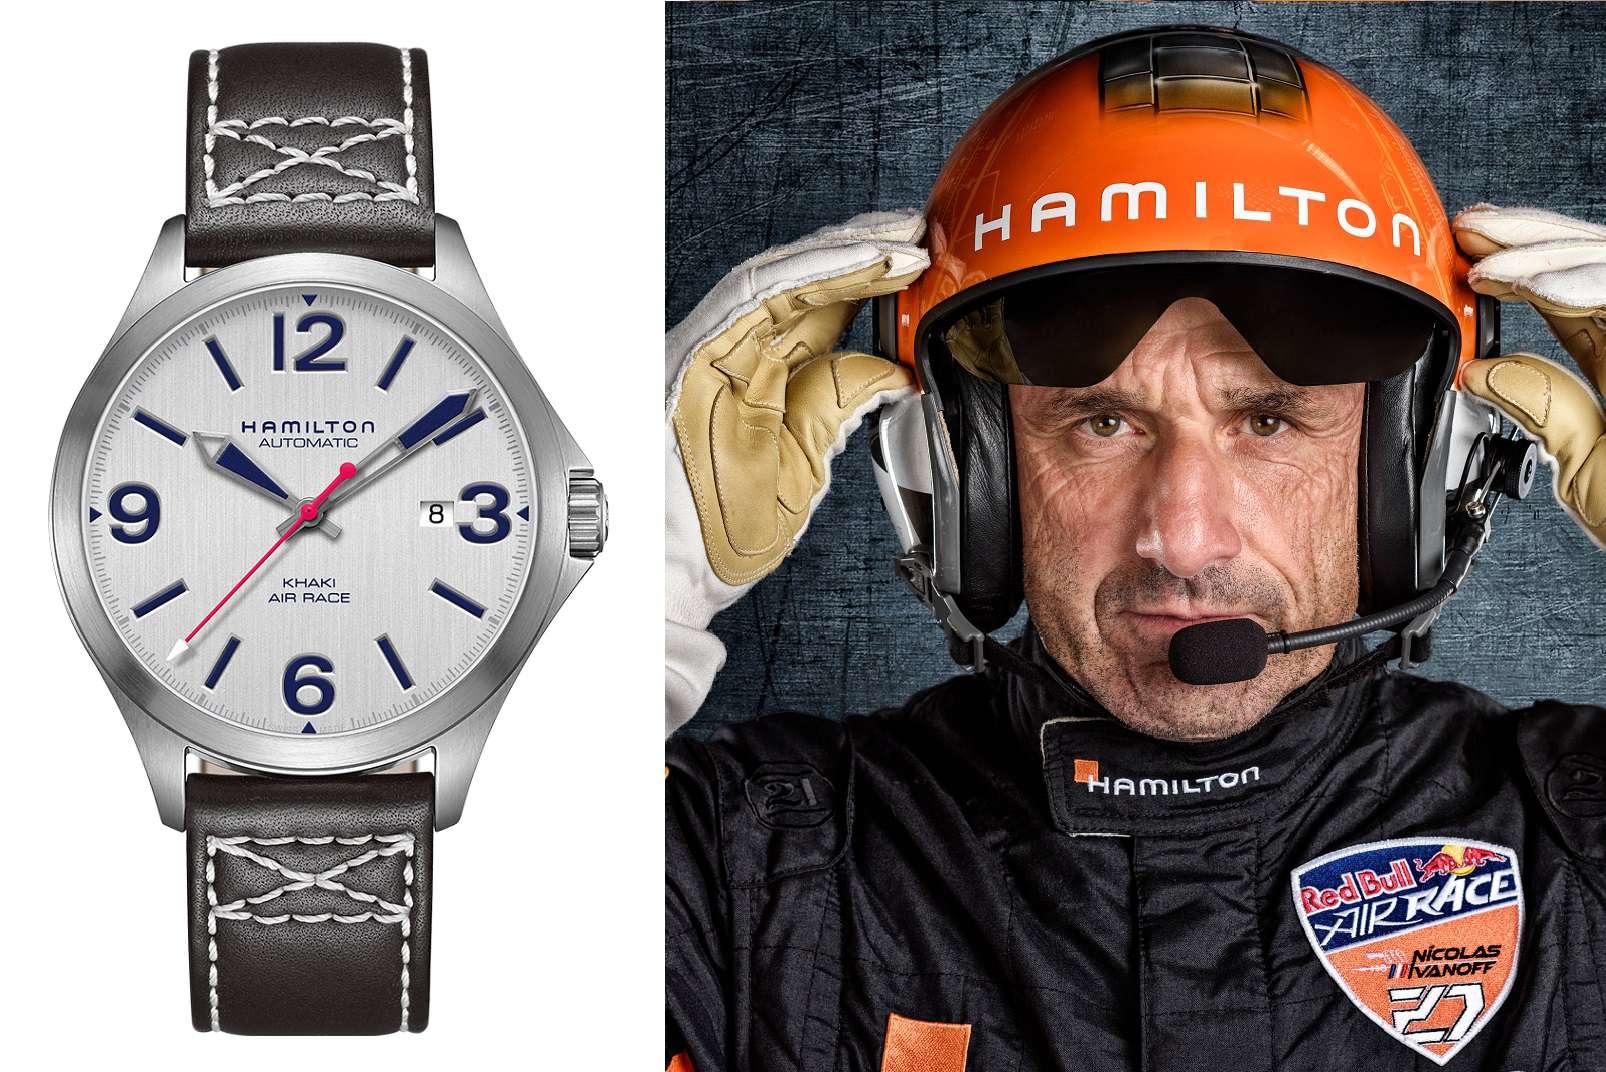 Hamilton Khaki Air Race, Nicolas Ivanoff